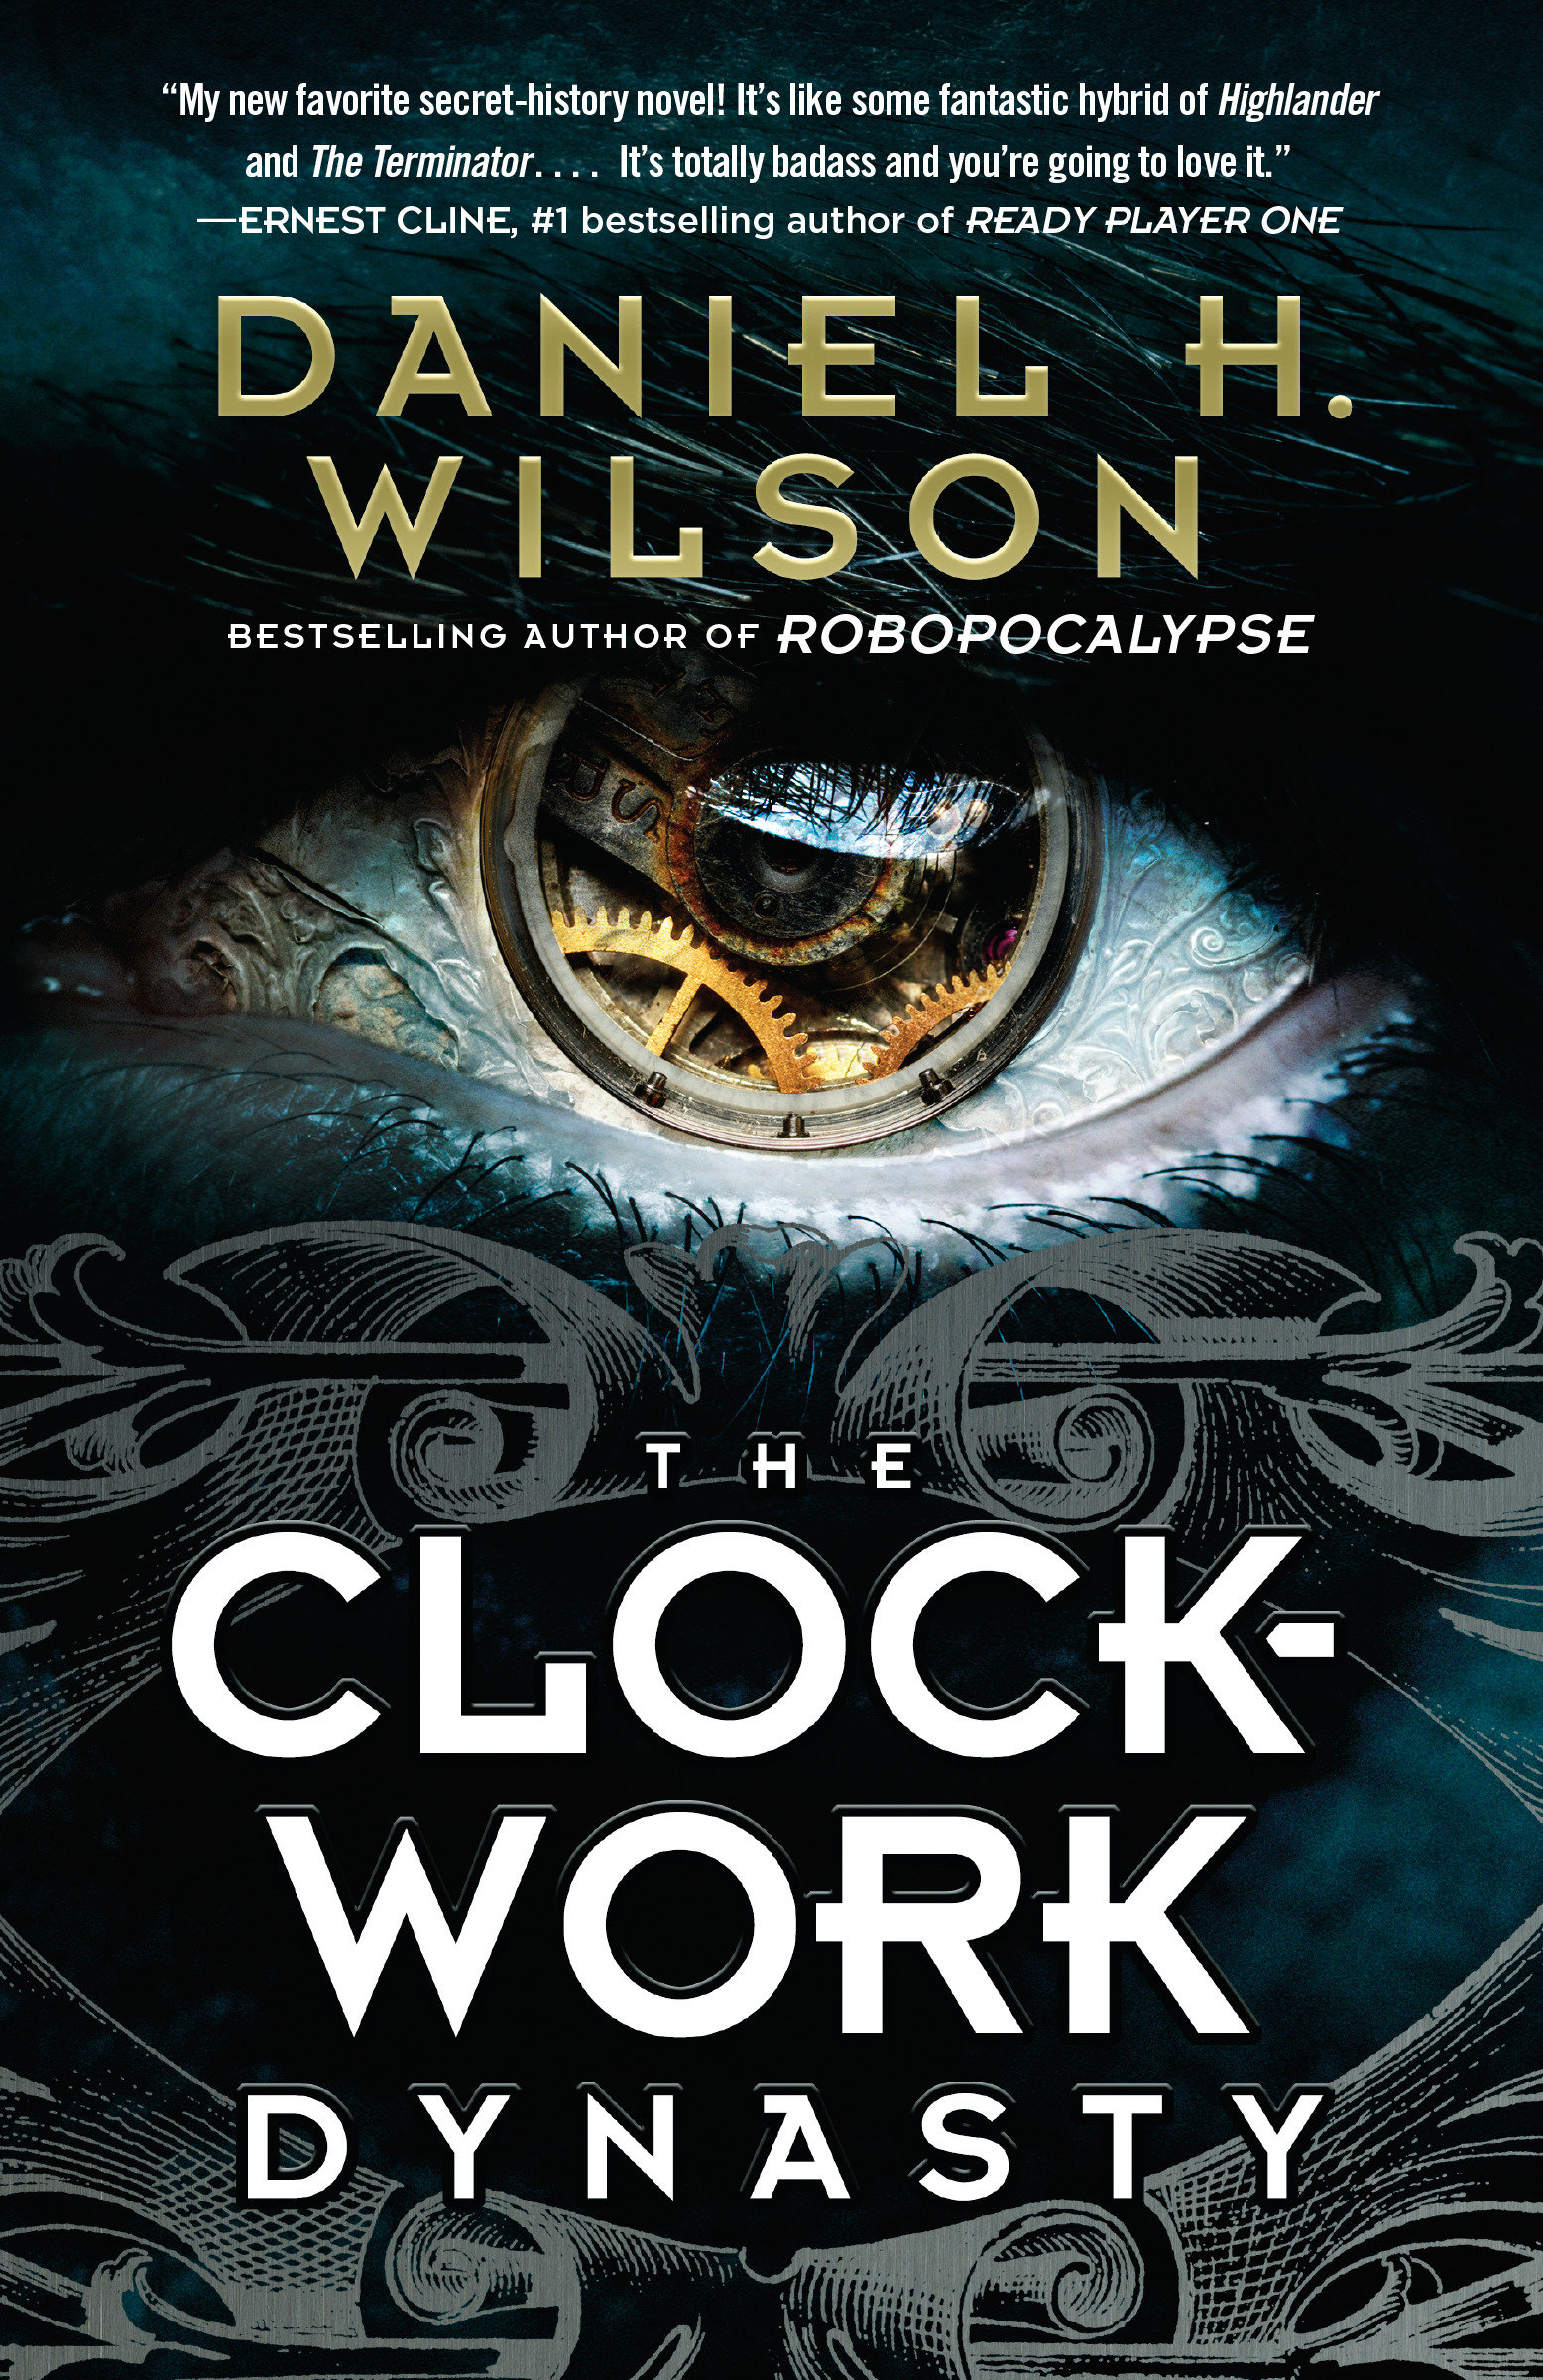 The Clockwork Dynasty [electronic resource] : A Novel